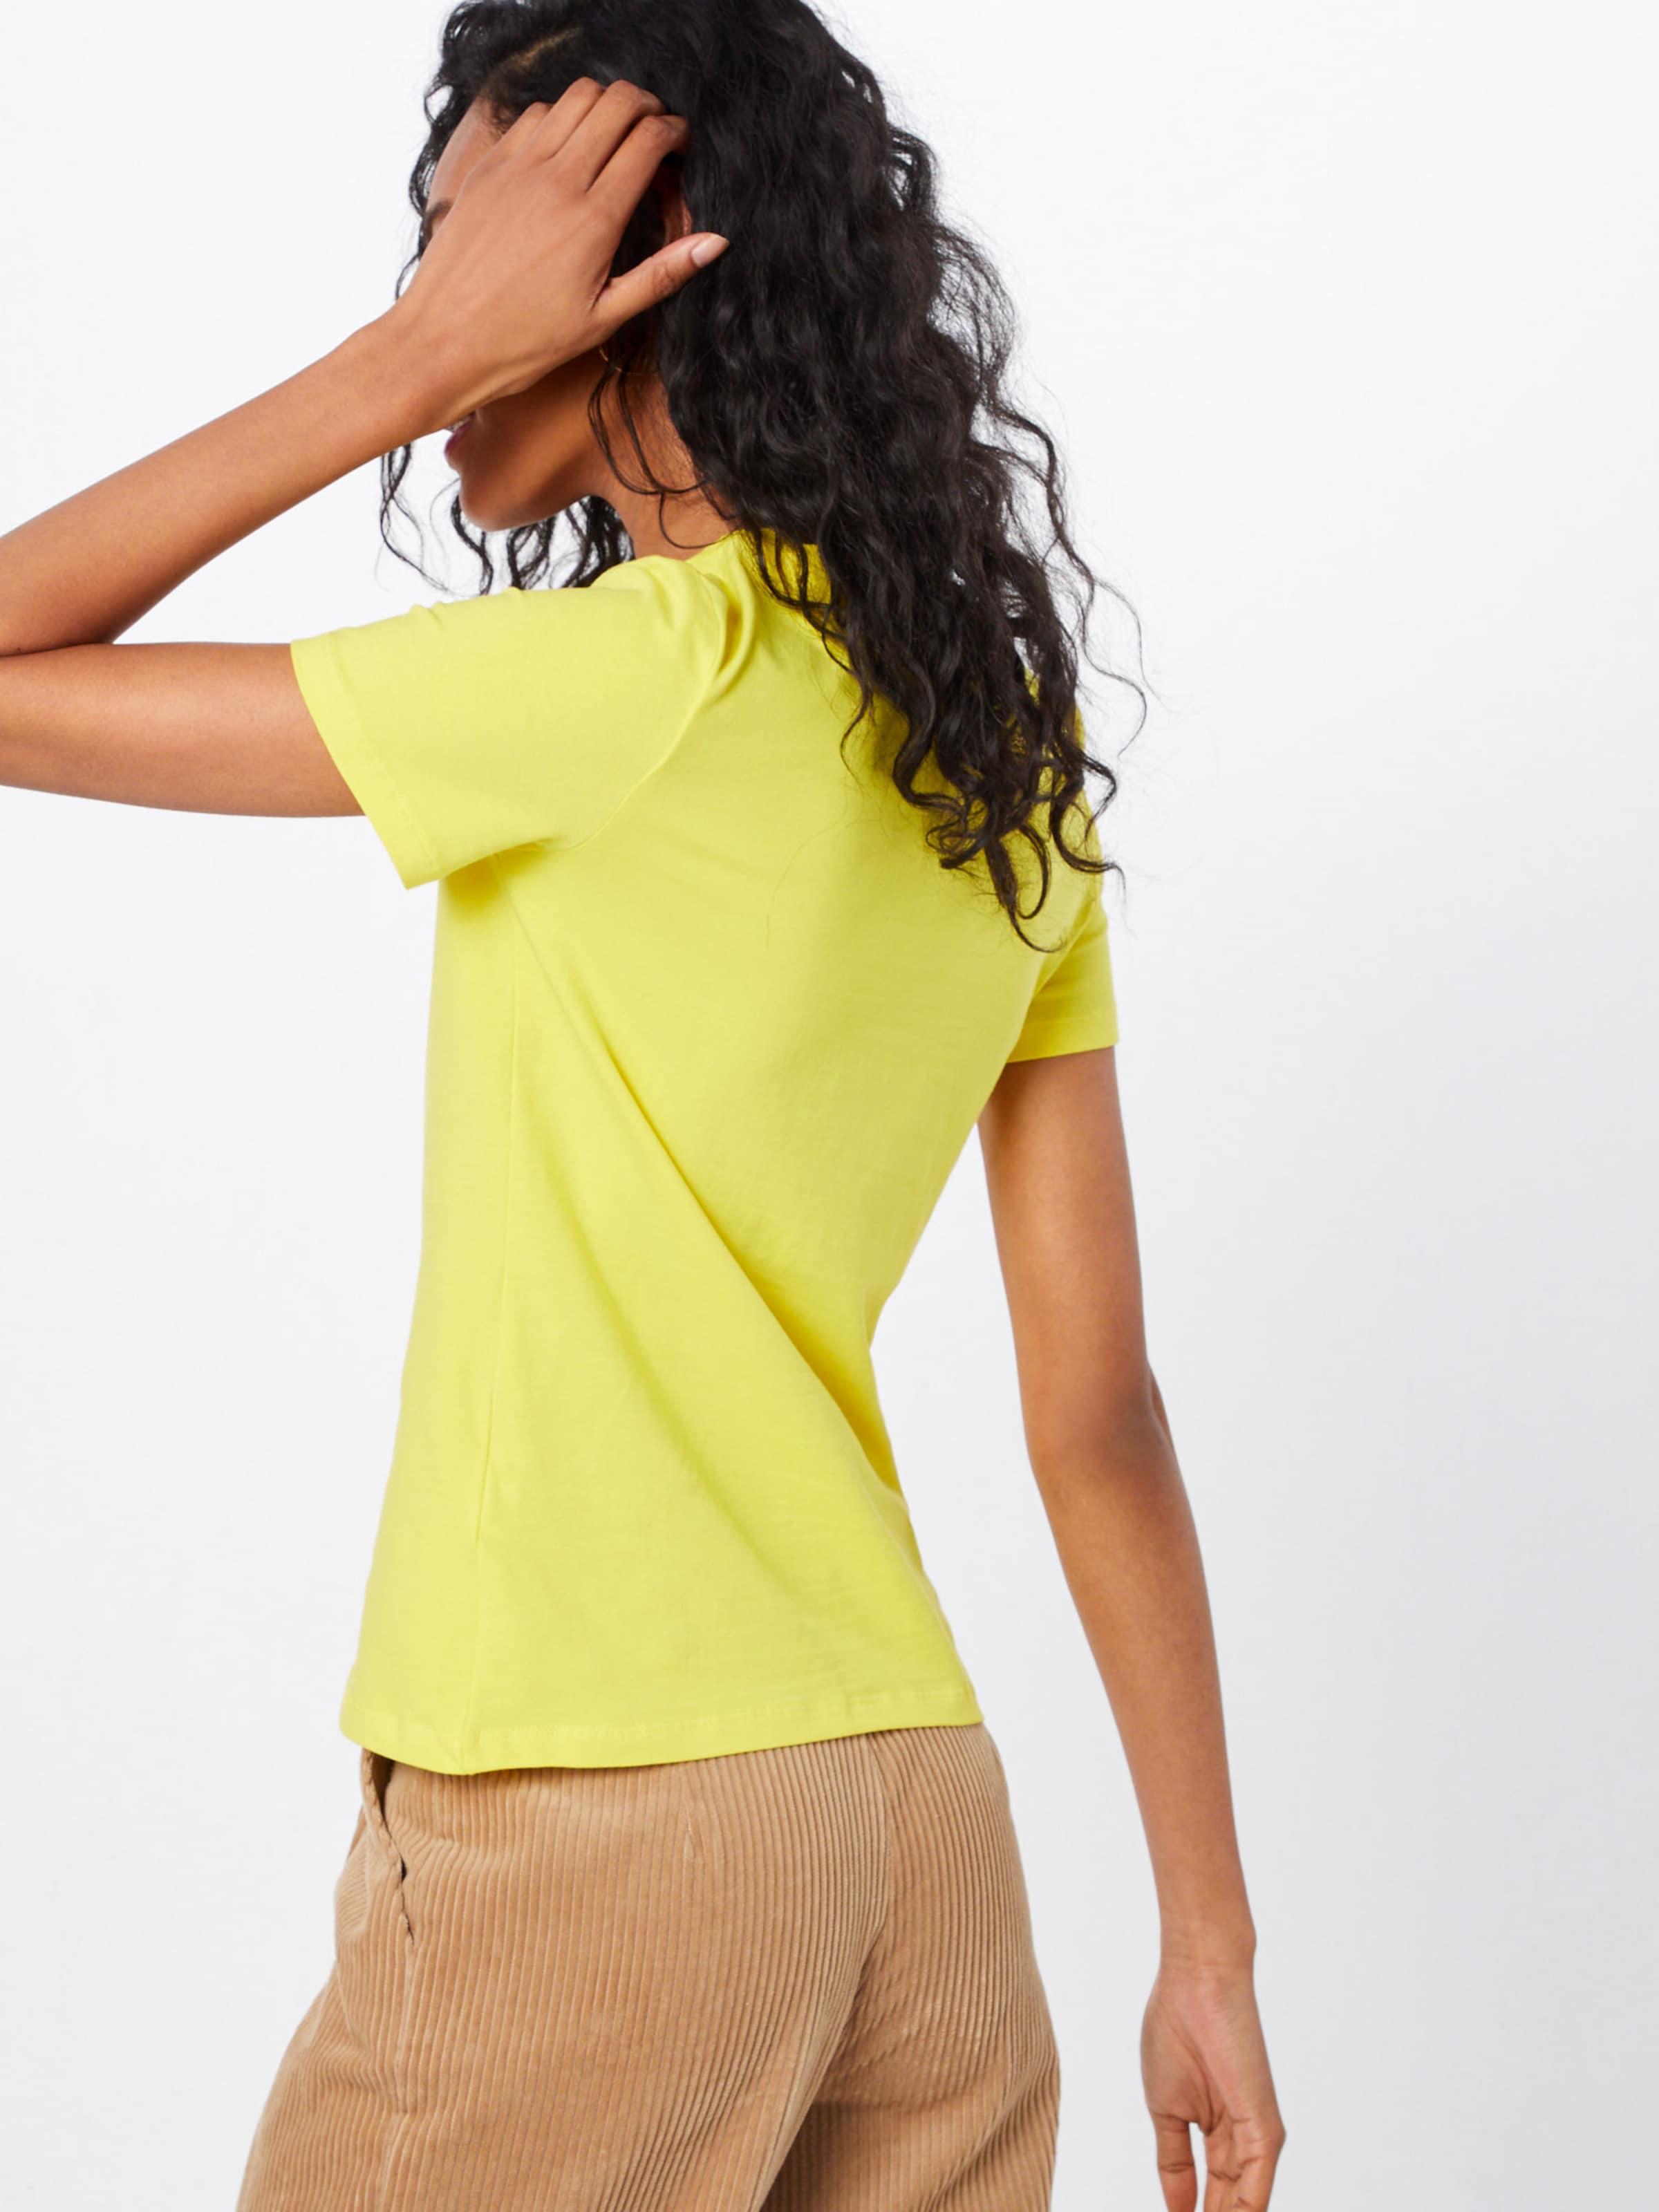 'qr shirt T One Blanc En Rhea' Street XN8n0OPwk